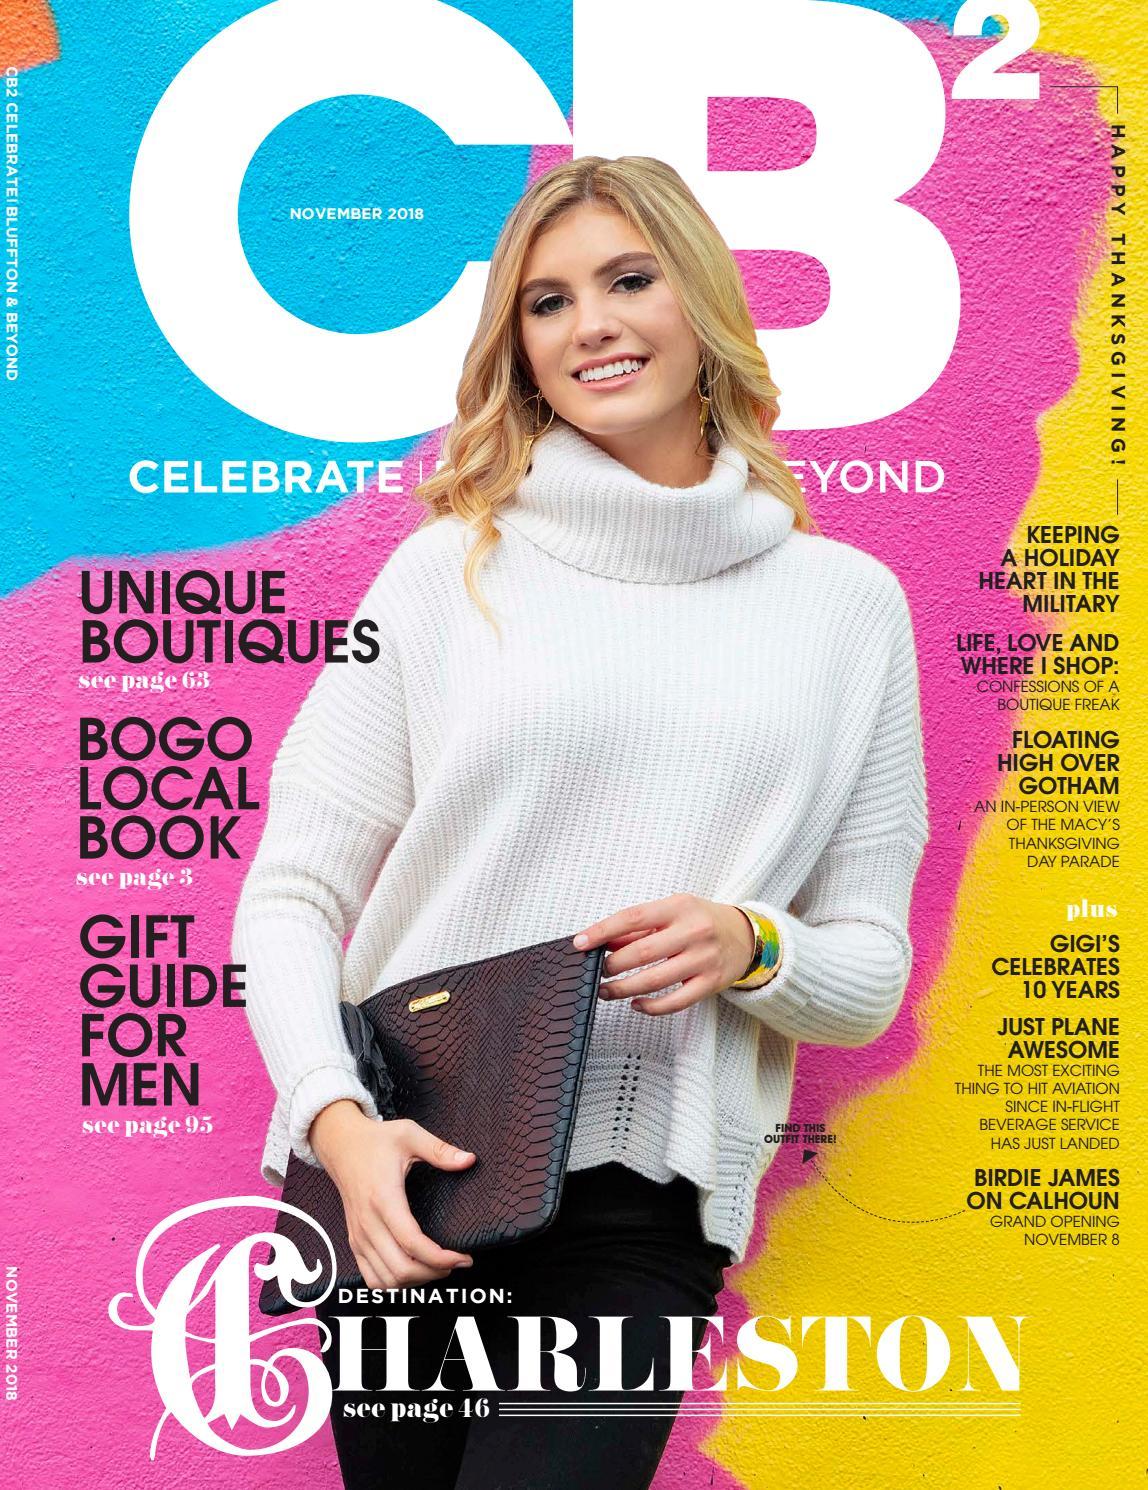 e2883868f28 Celebrate Bluffton   Beyond Magazine and Celebrate Hilton Head - November  2018 Issue by CH2  CB2 - issuu